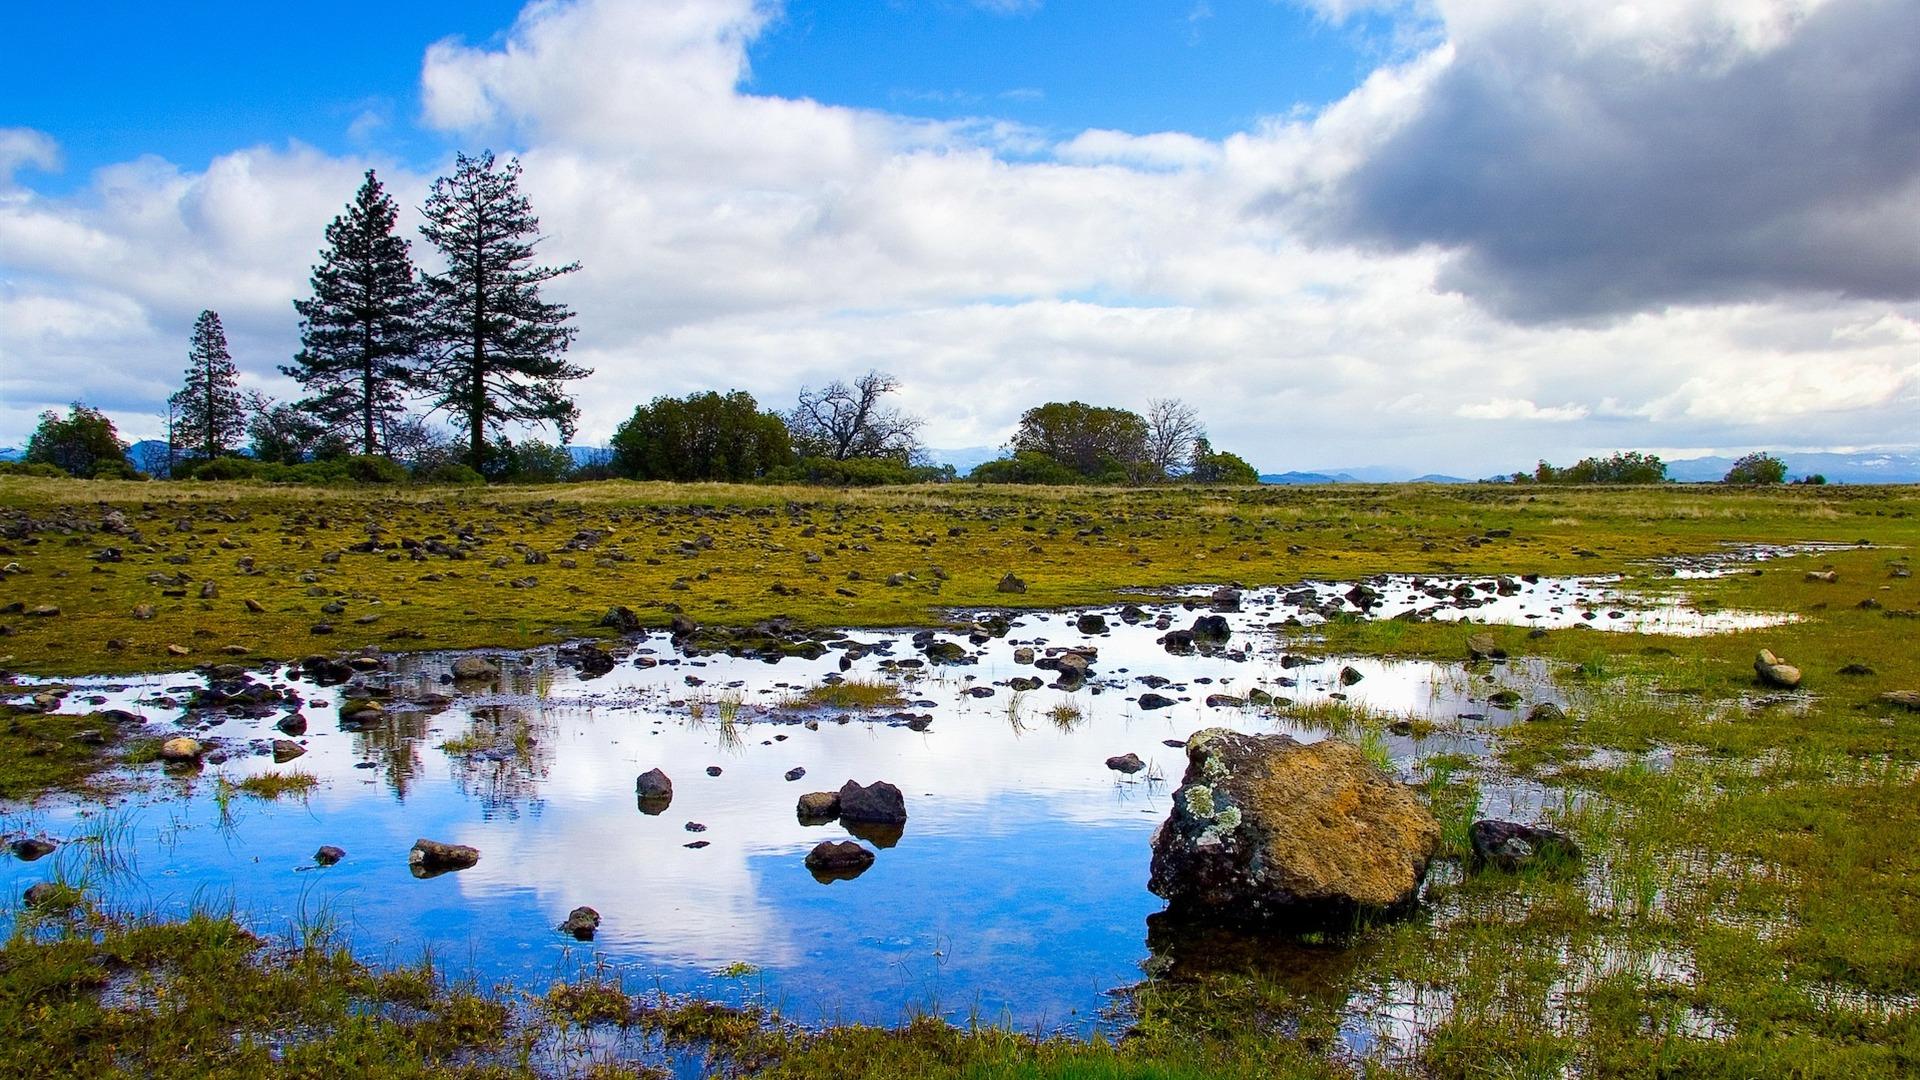 Beschreibung featured landschaft tapeten ersticken schönheit 21